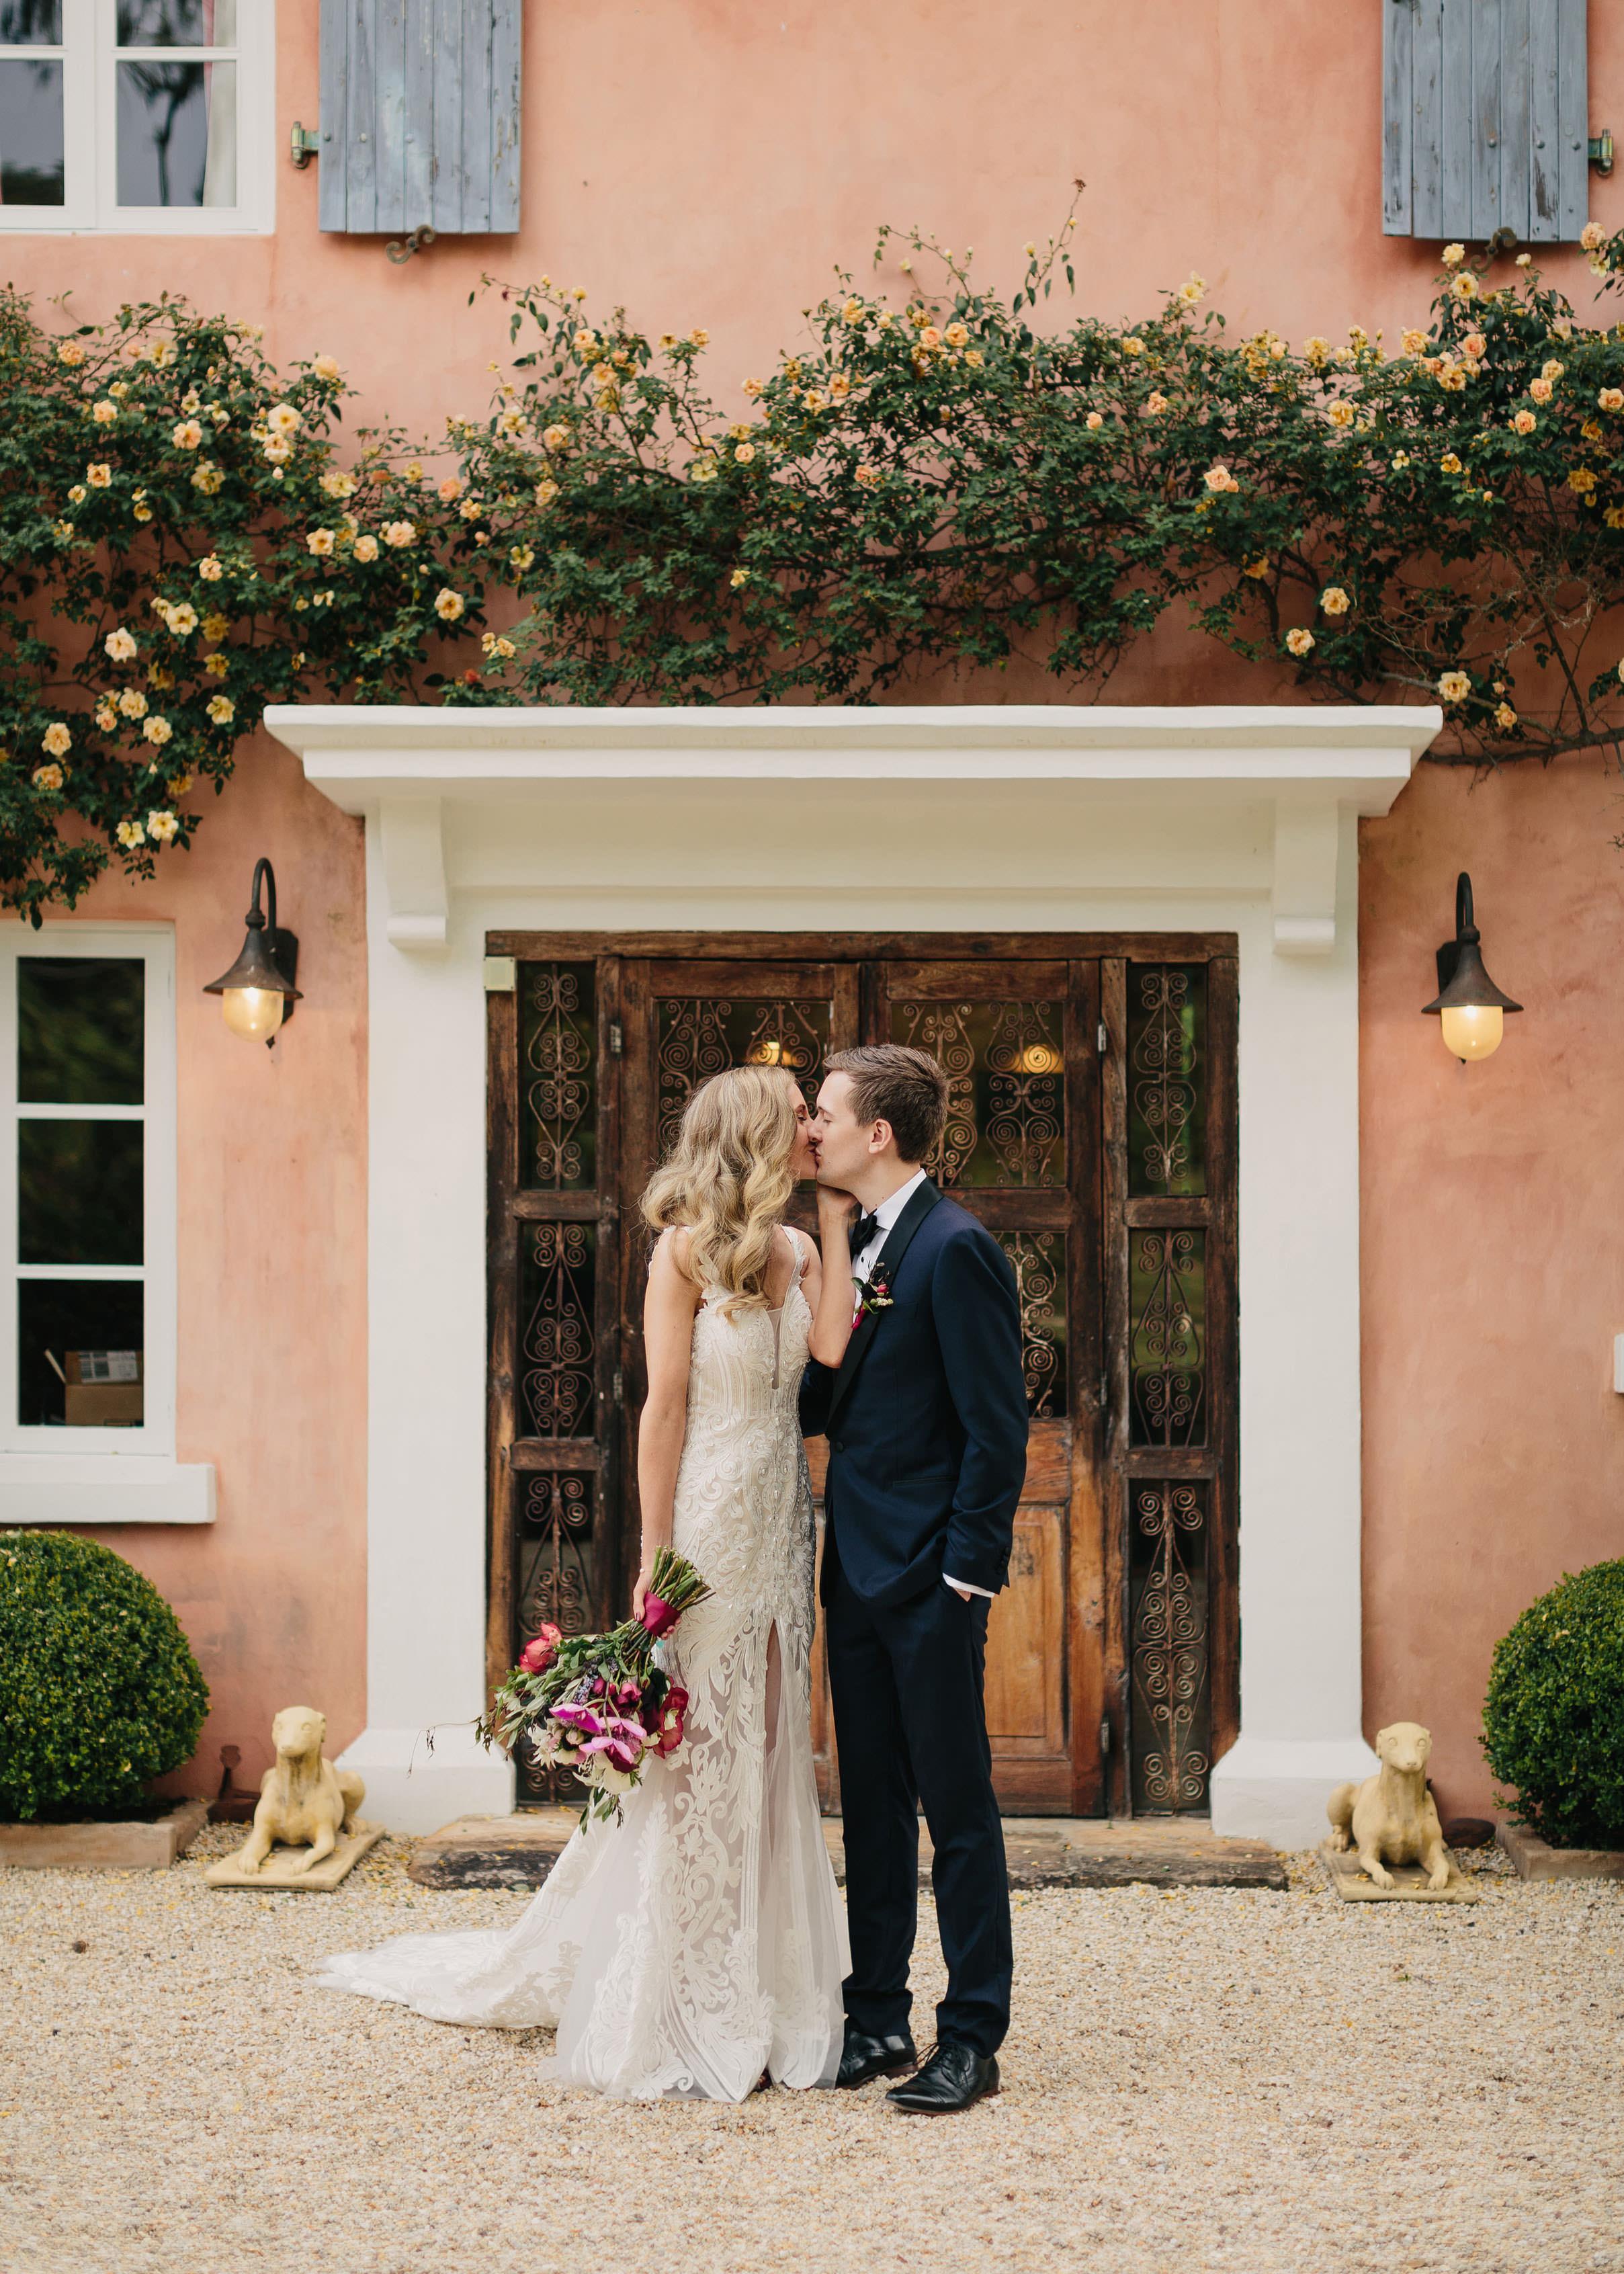 079_hunter_valley_wedding_photography_redleaf_paul_bamford_finchandoak.jpg